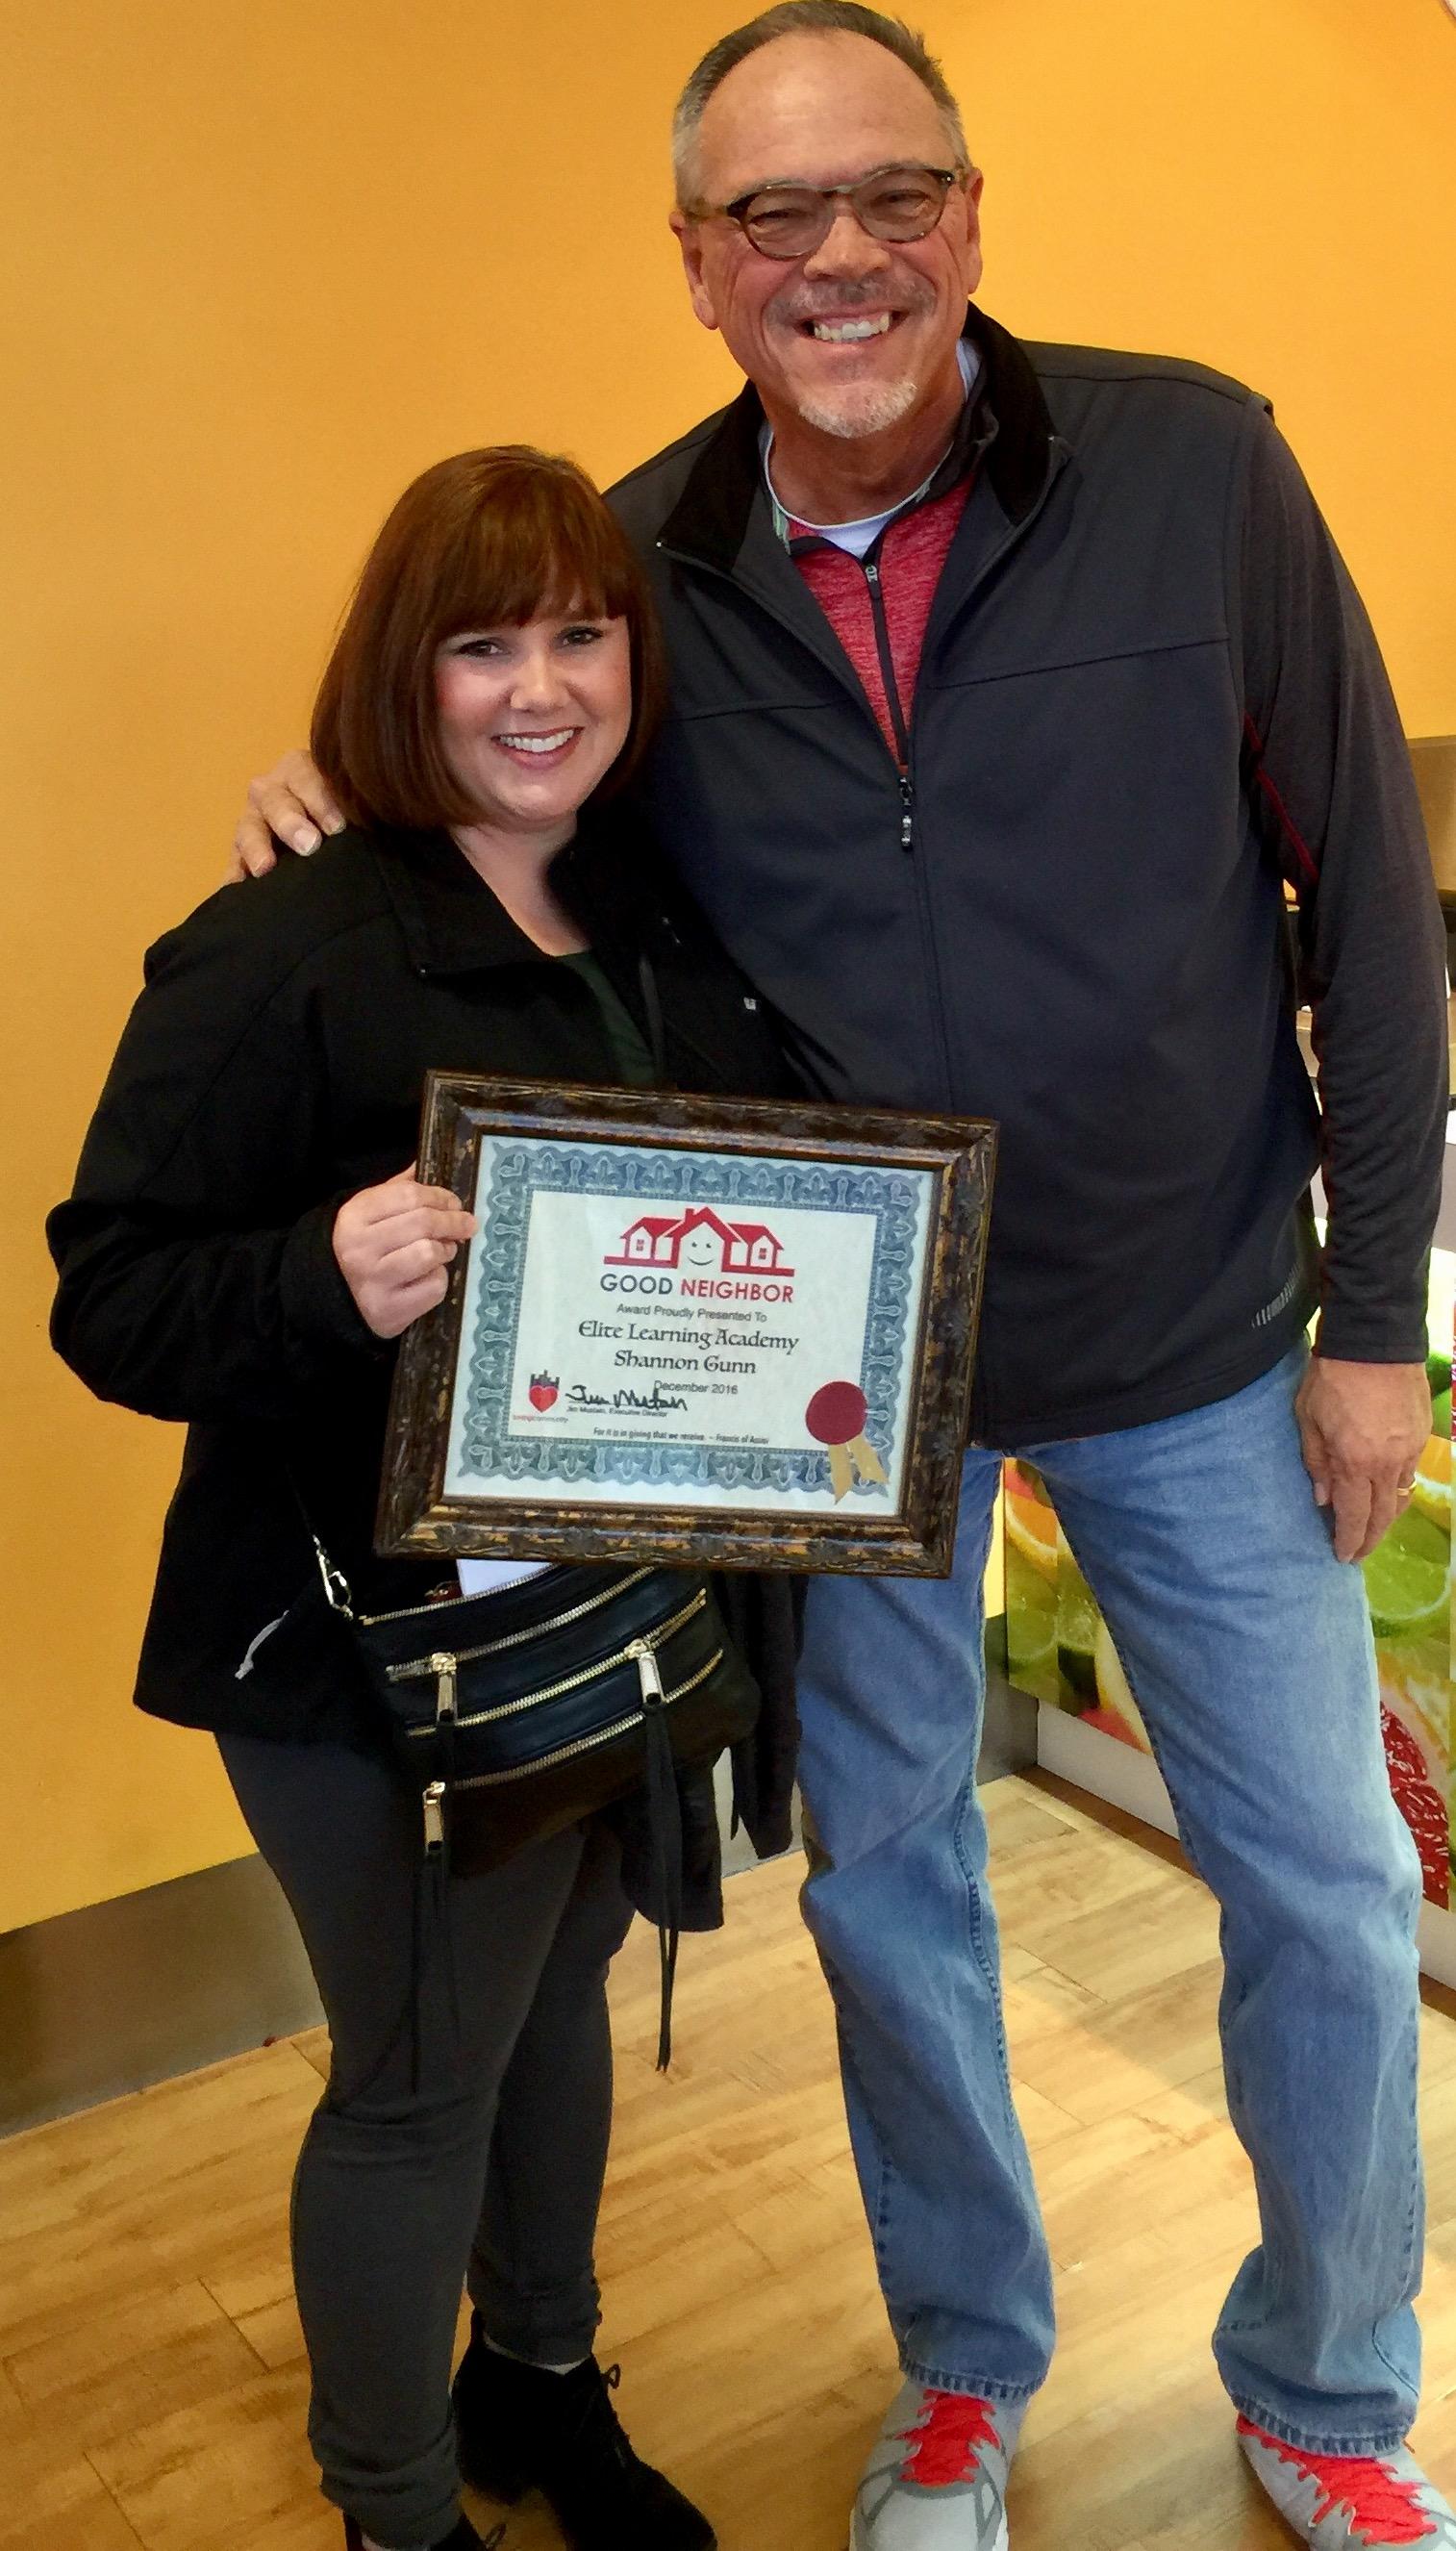 Elite Learning Academy and Founder Shannon Gunn Recipient of December Good Neighbor Award